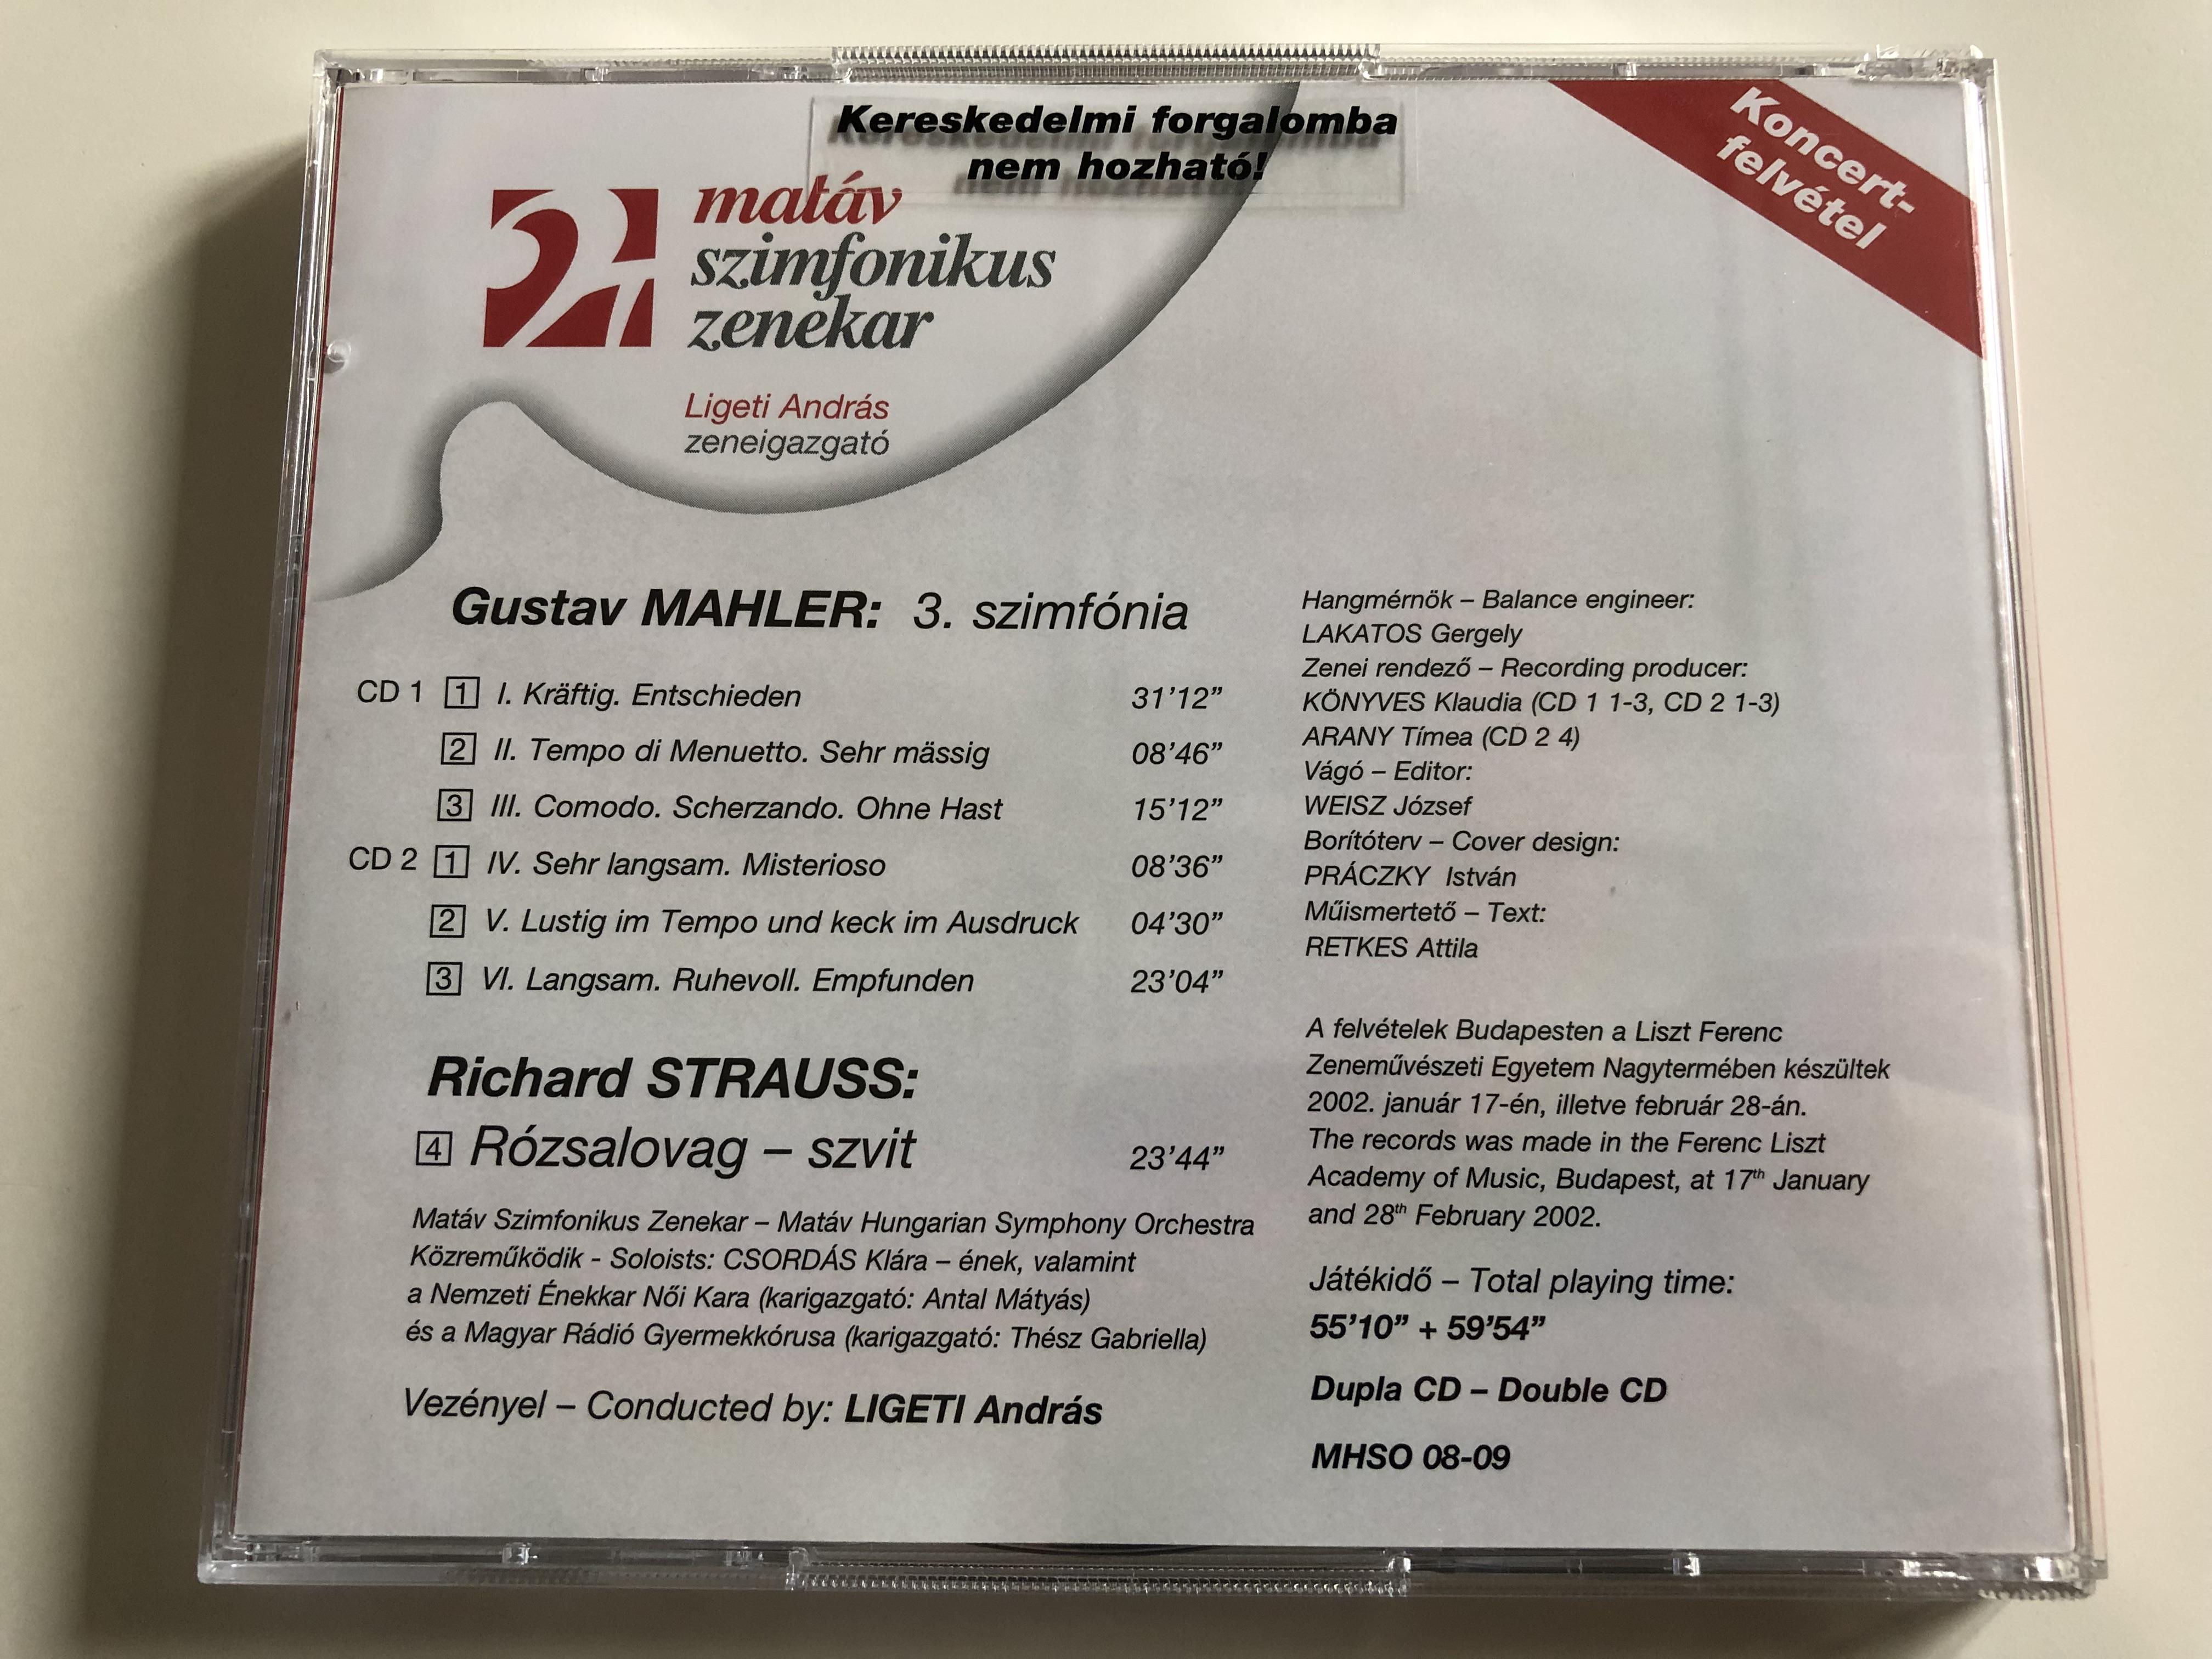 gustav-mahler-3.-szimf-nia-richard-strauss-r-zsalovag-szvit-mat-v-szimfonikus-zenekar-mat-v-symphonic-orchestra-hungary-conducted-by-ligeti-andr-s-concert-recording-double-cd-mhso-08-09-6-.jpg